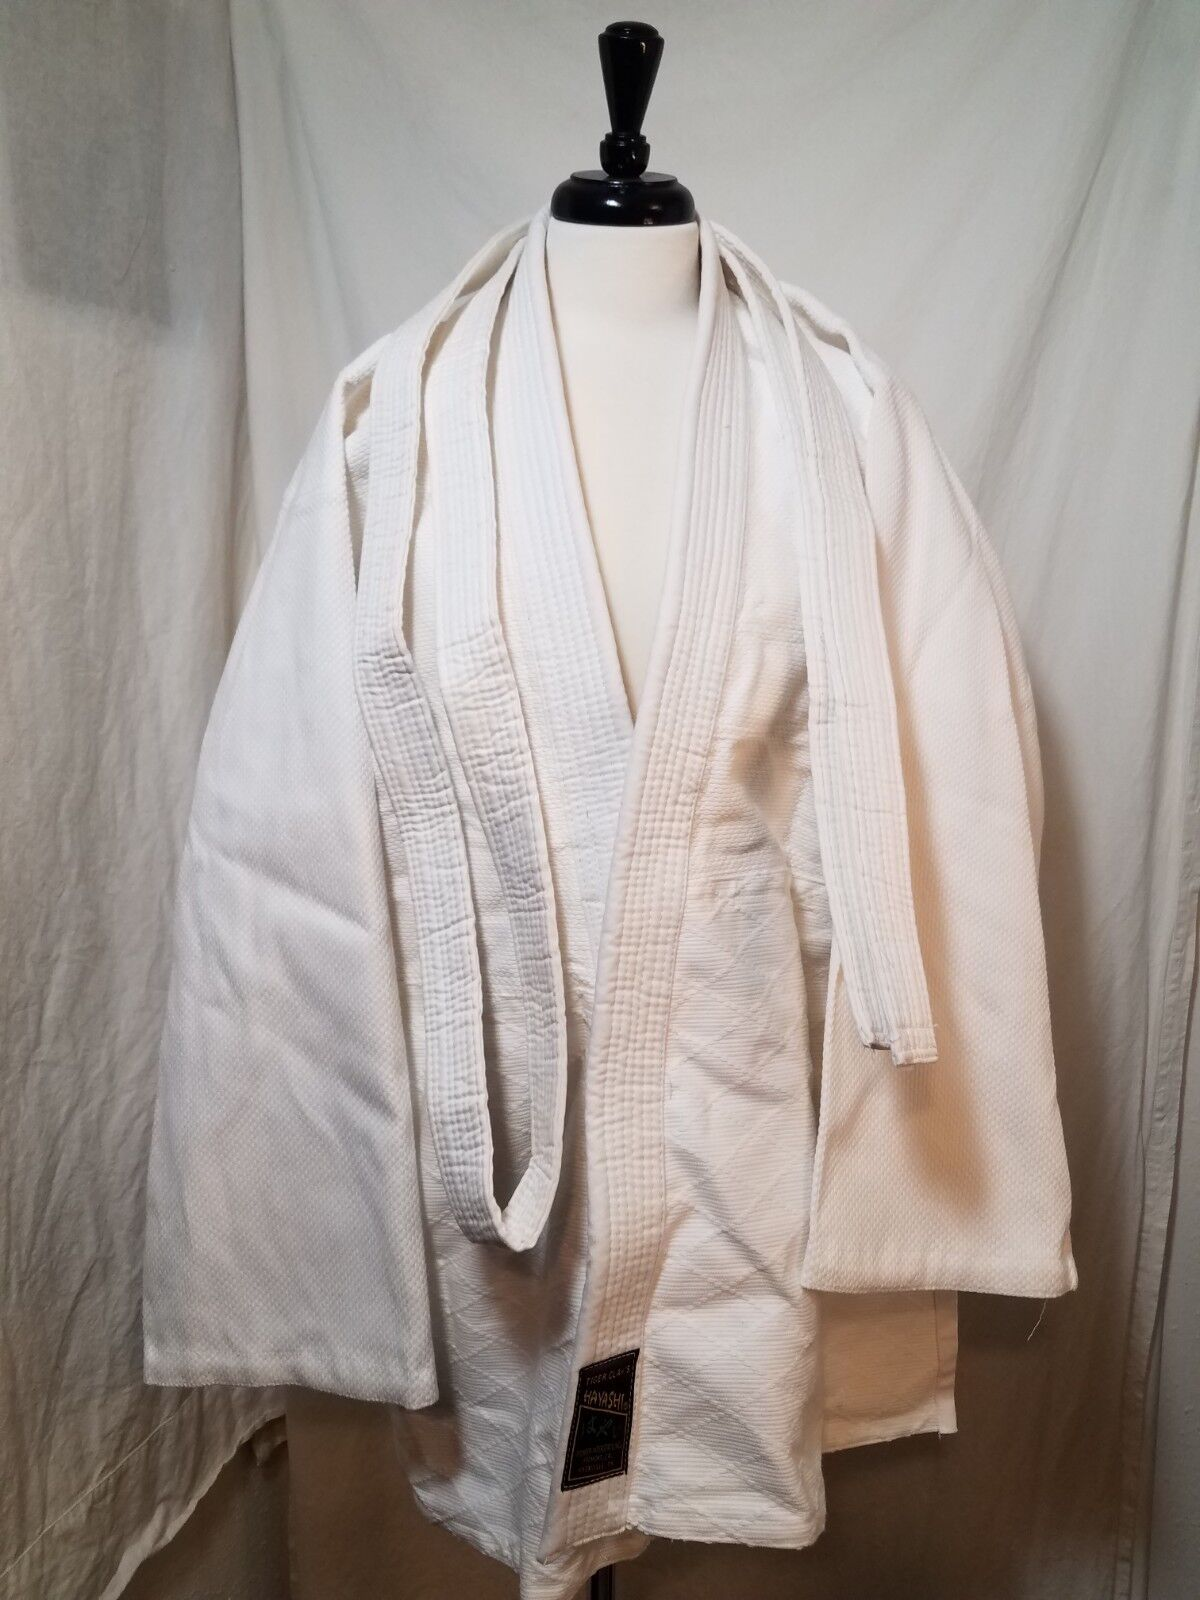 NEW Tiger  Claw's Hayashi White Judo uniform with belt unisex size 4  brand